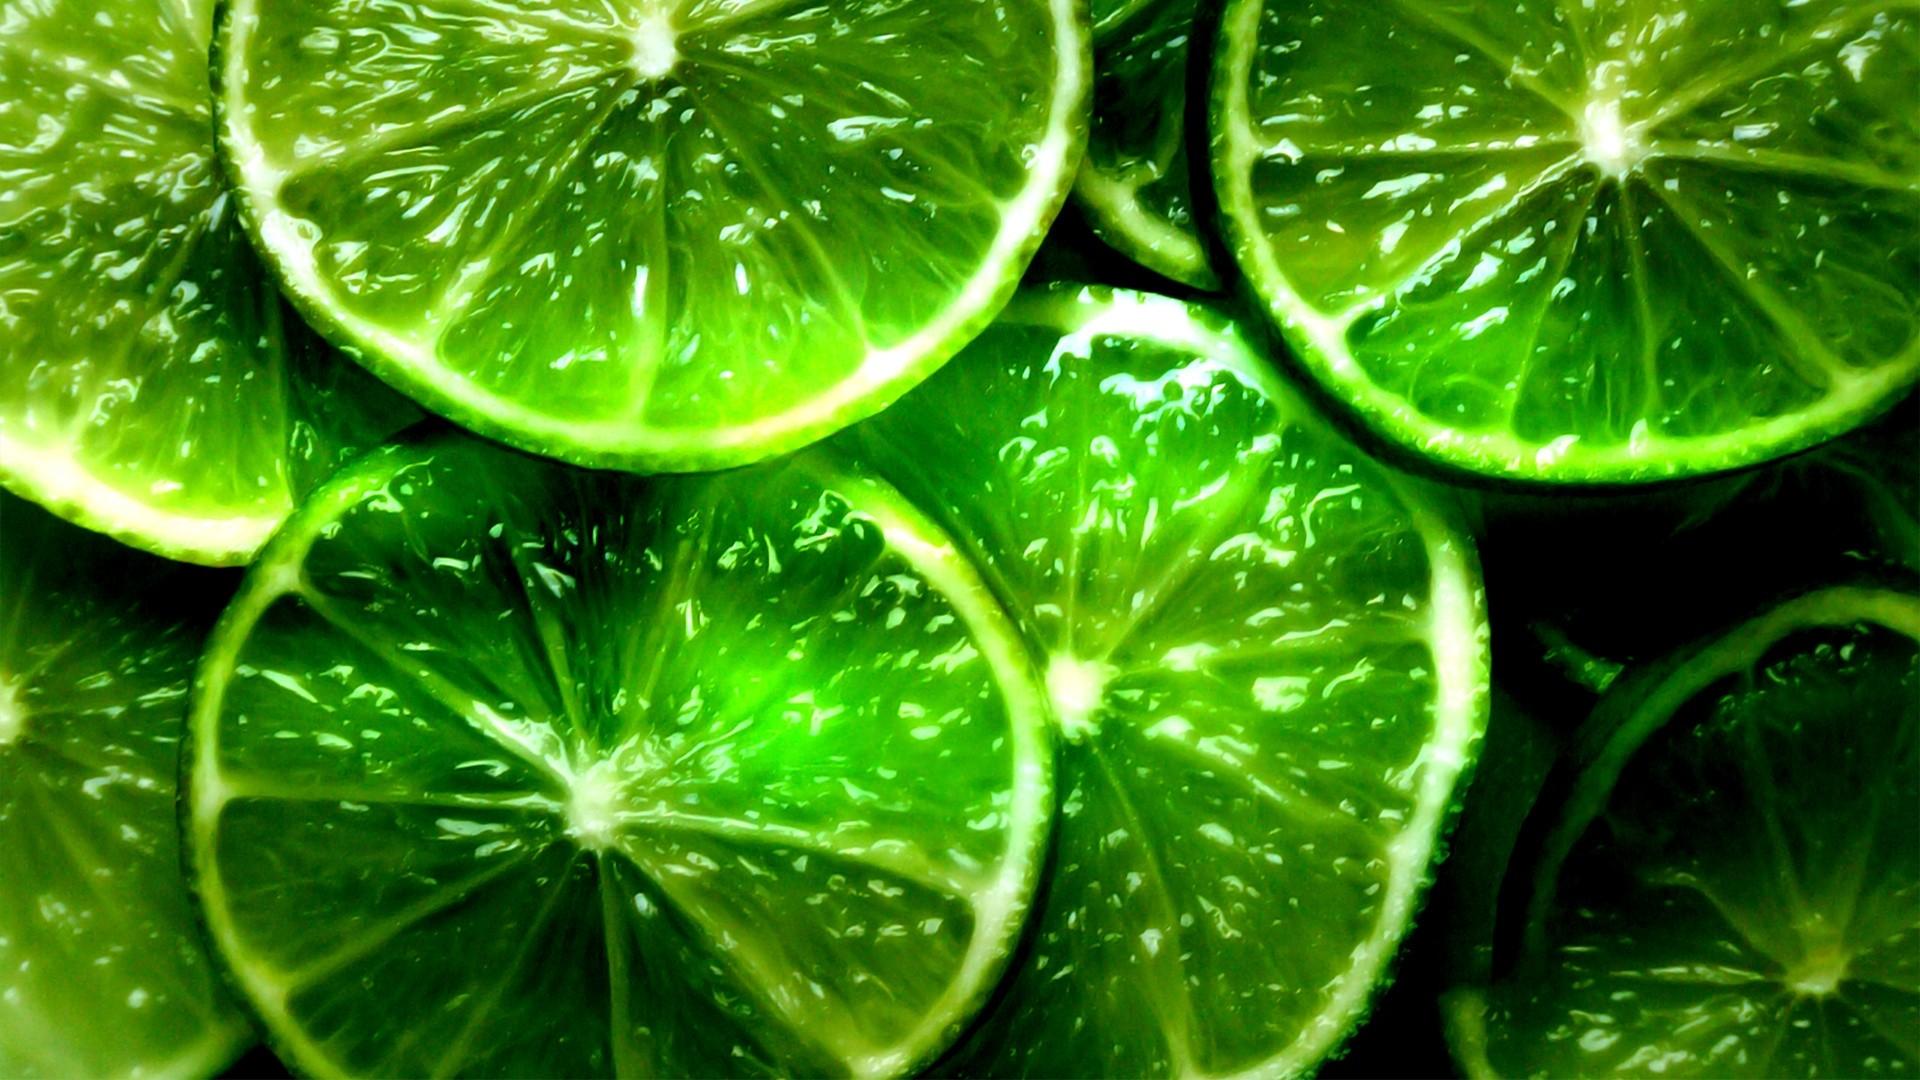 Green Wallpaper 1920x1080 62 Images